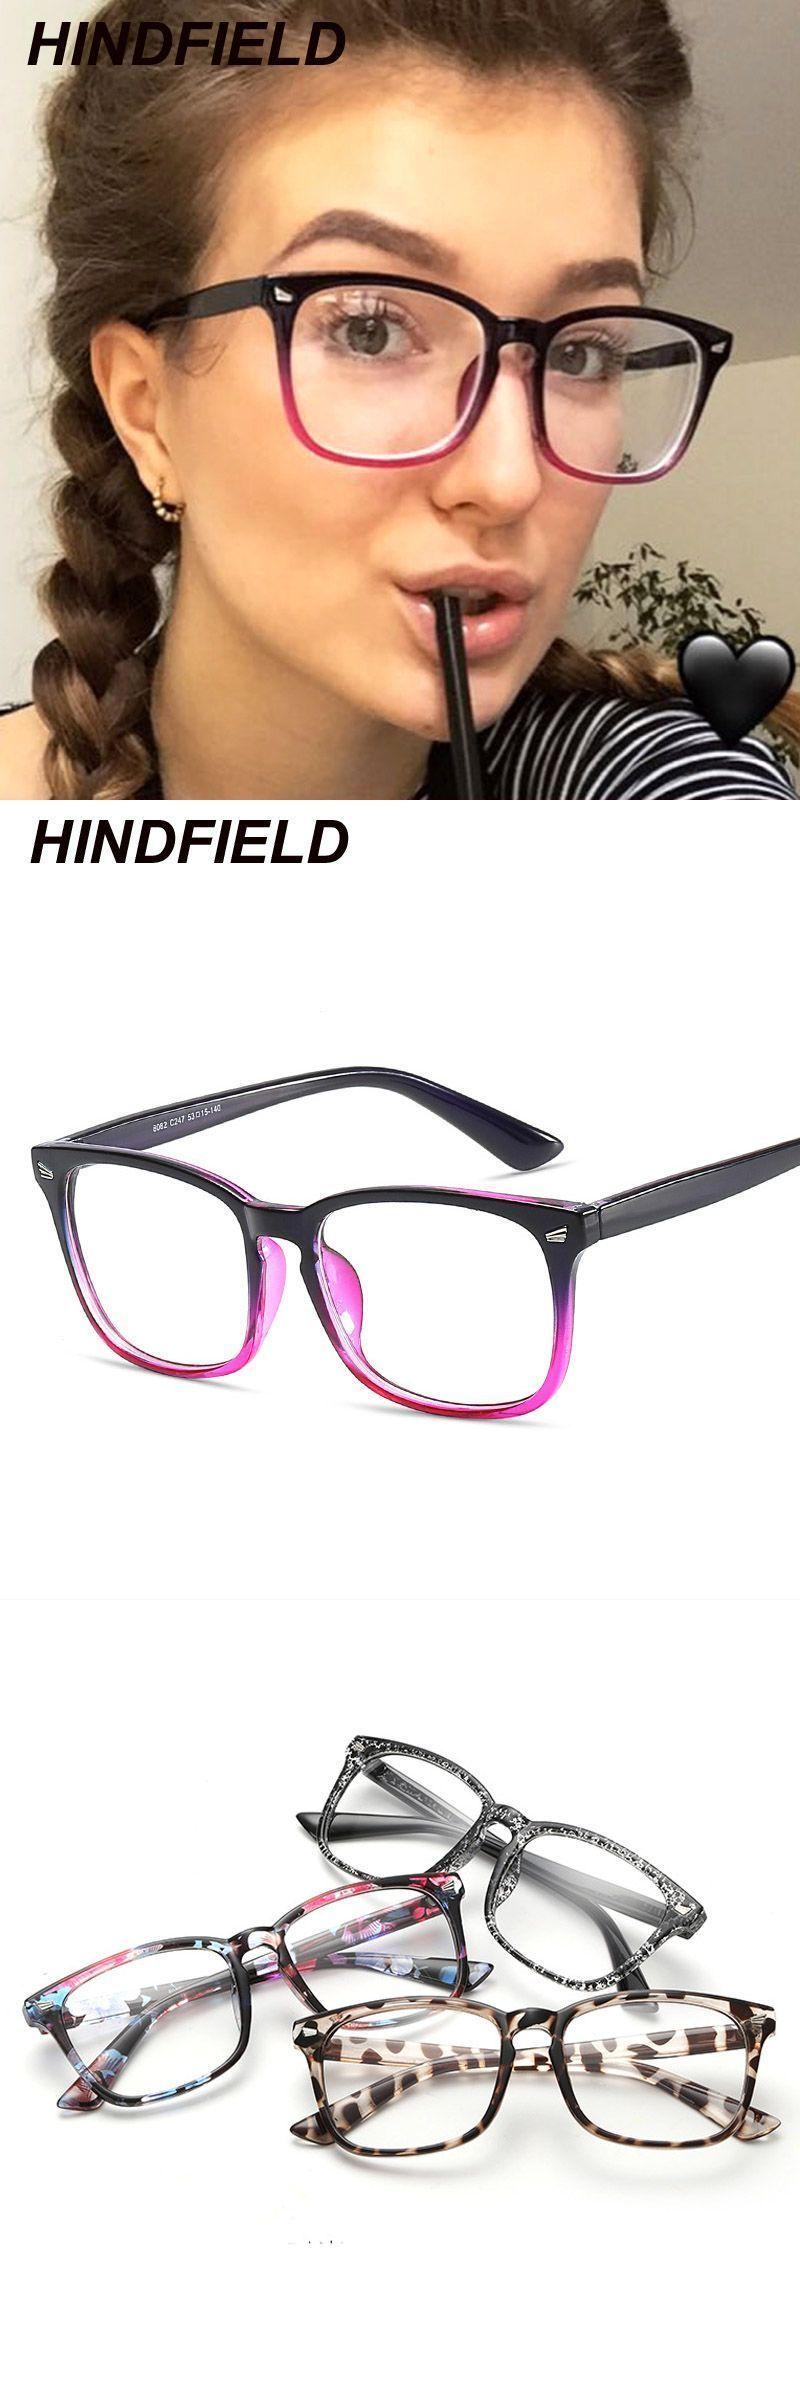 3fbfea815909 Square clear glasses women fashion transparent lens eyeglasses optical  frames computer eyewear spectacle frames fake glasses